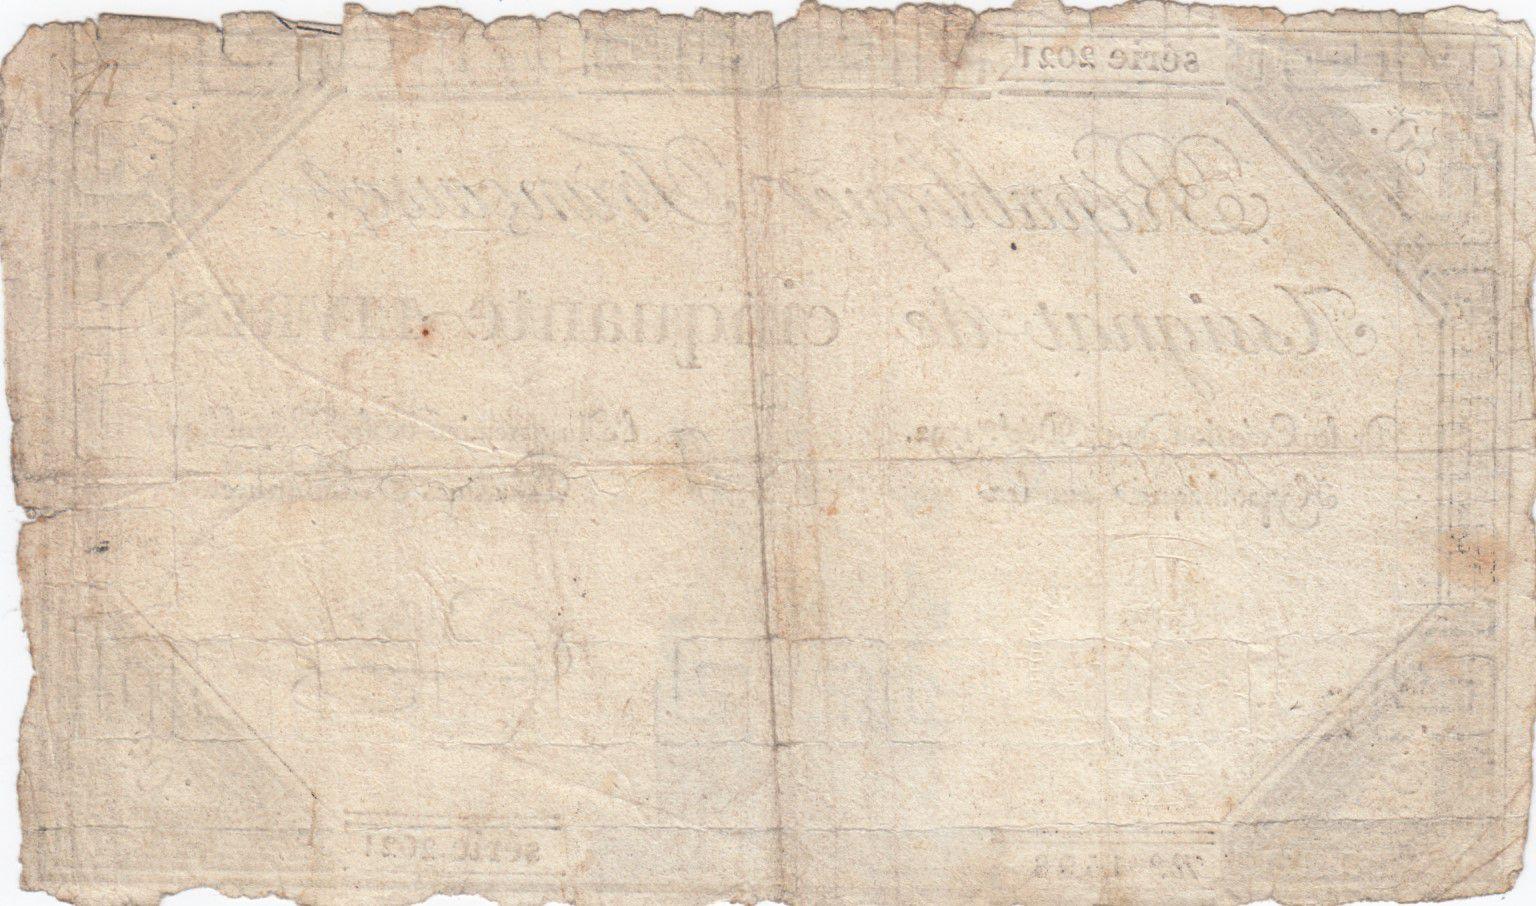 France 50 Livres France assise - 14-12-1792 - Sign. Dubois